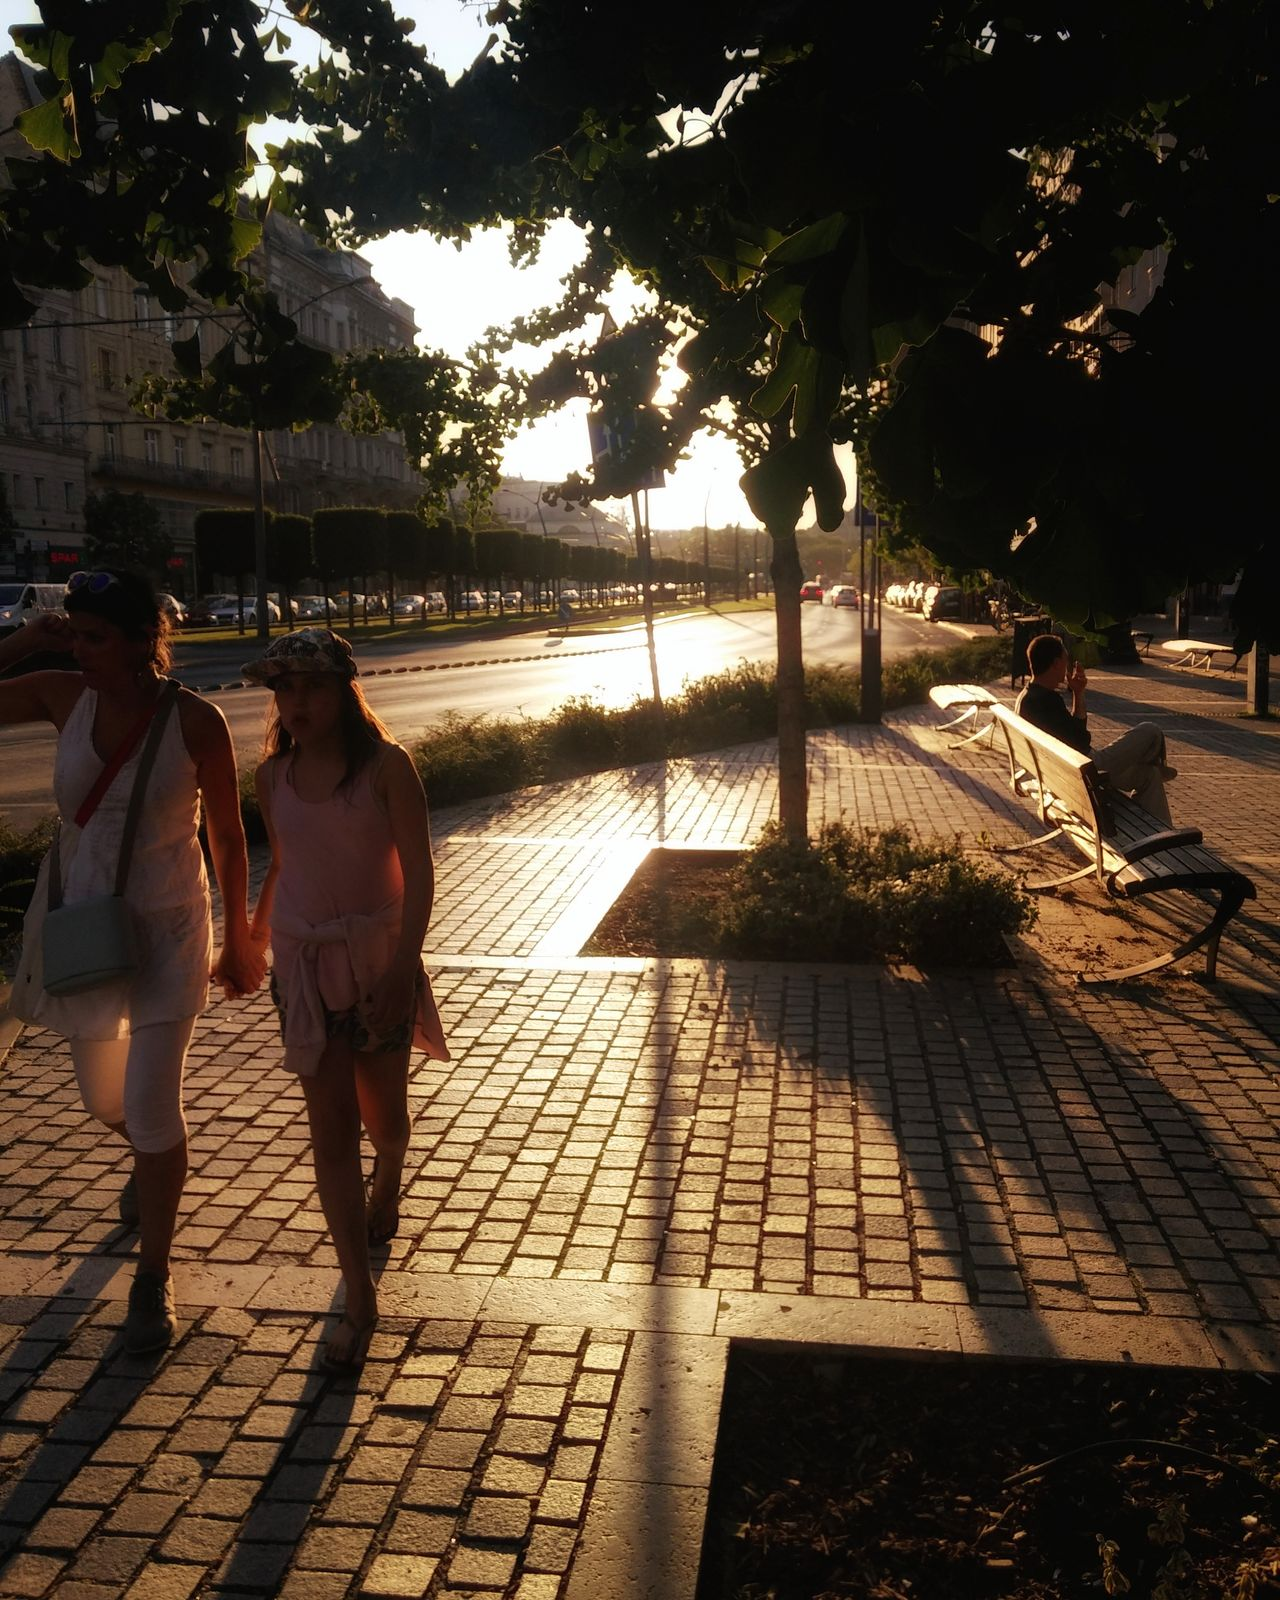 Budapest Streetview Street Light Budapest Streetphotography Streetphotography Streetcapture Streetviewphotography Street Peopleonthestreet People Streetfashion Silhouette Photography Silhouettes